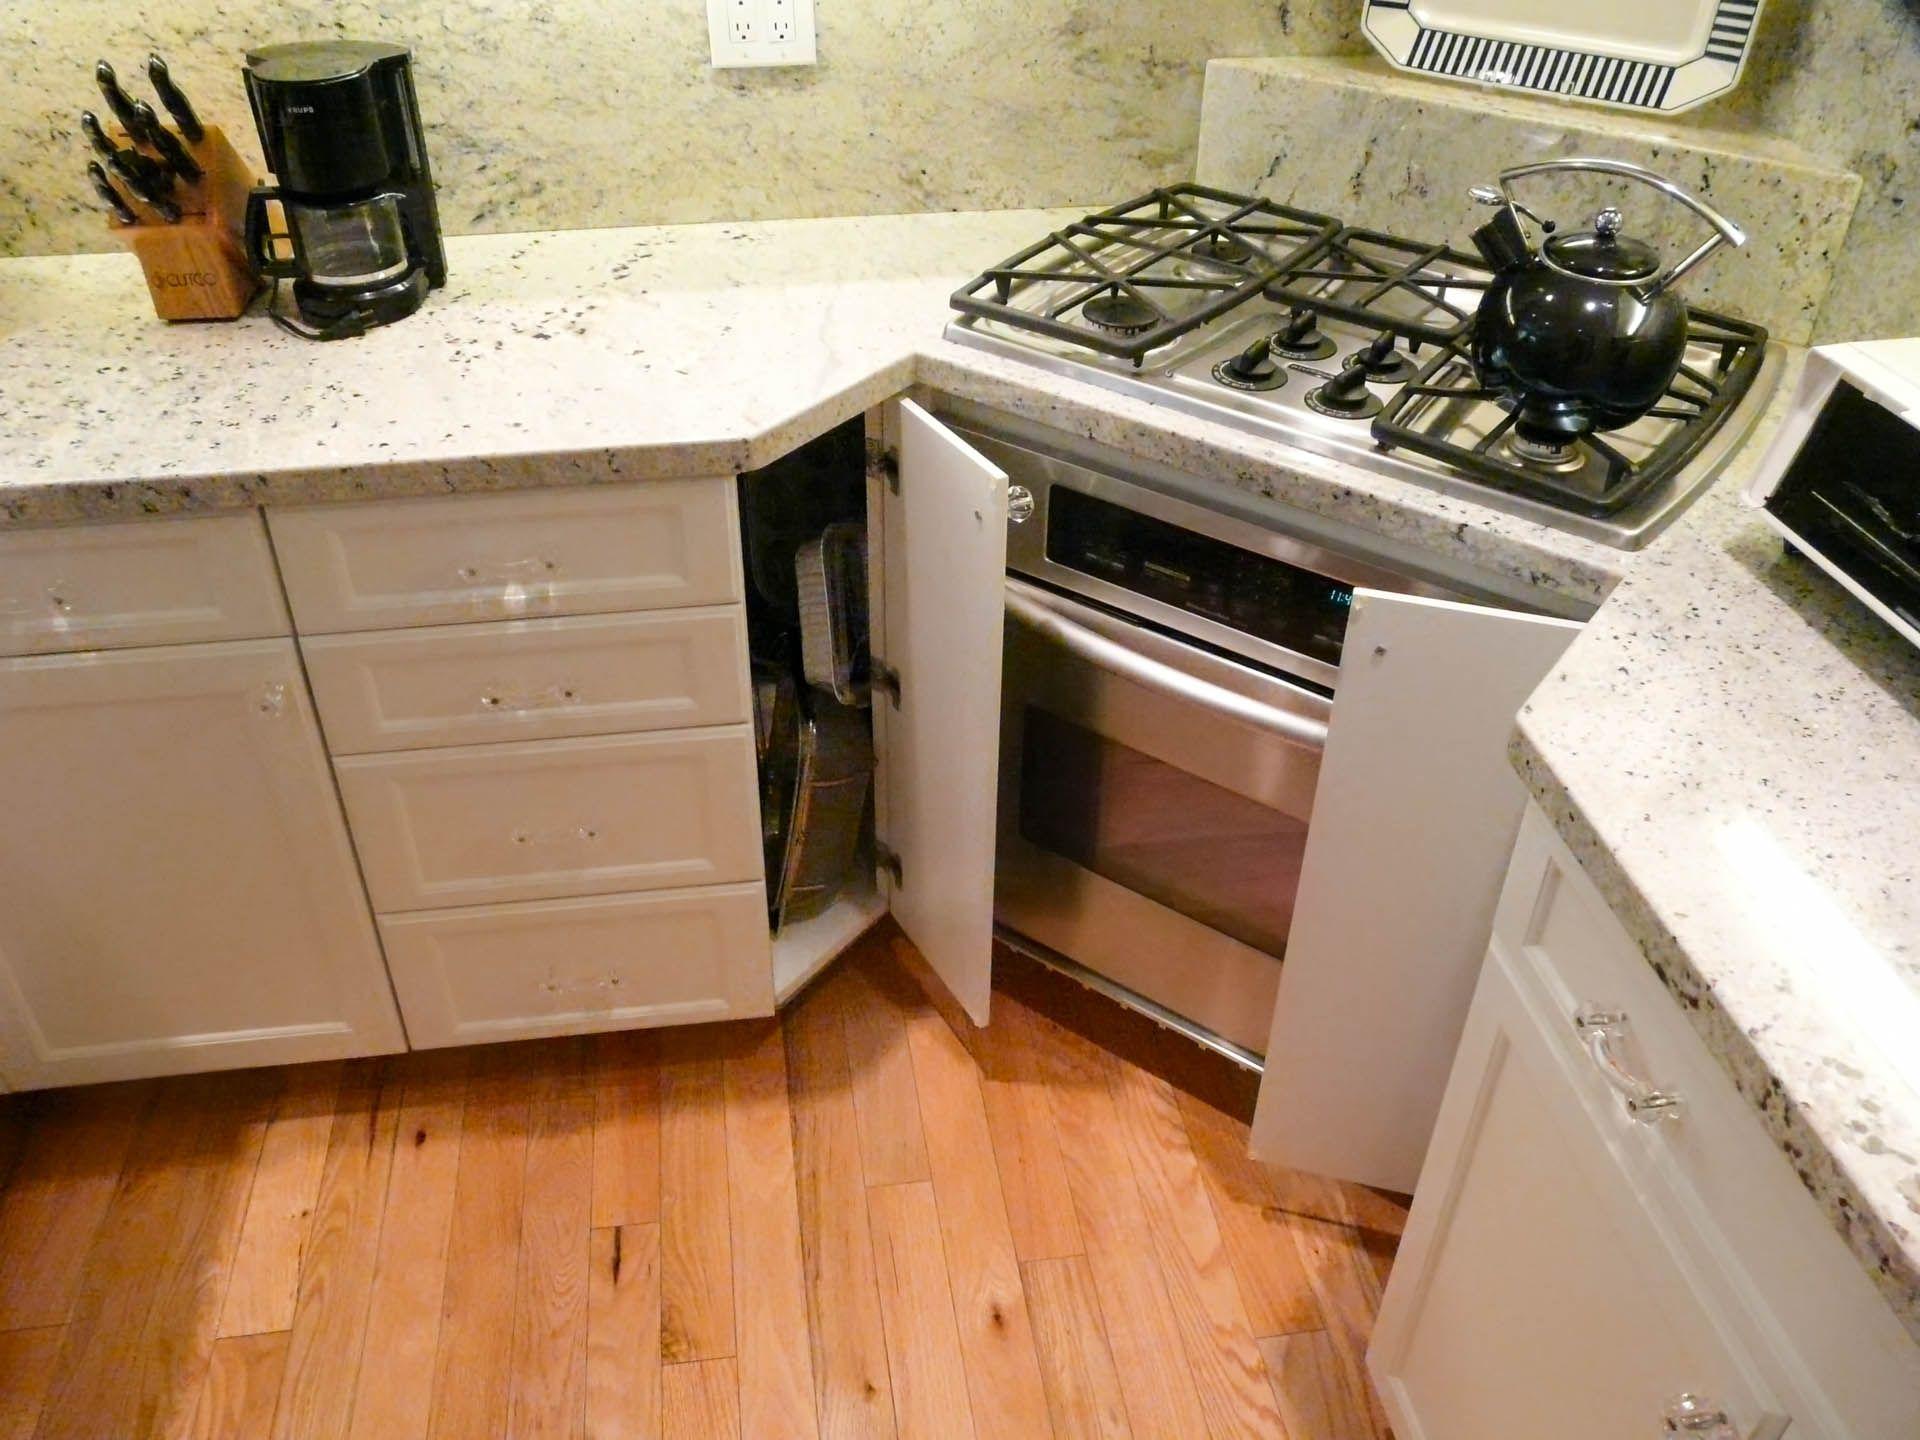 Angled Cabinet Corners Open Kitchen Design Remodeling By Danilo Nesovic Designer Builder Dndb Info Kitchen Remodel Kitchen Design Remodel